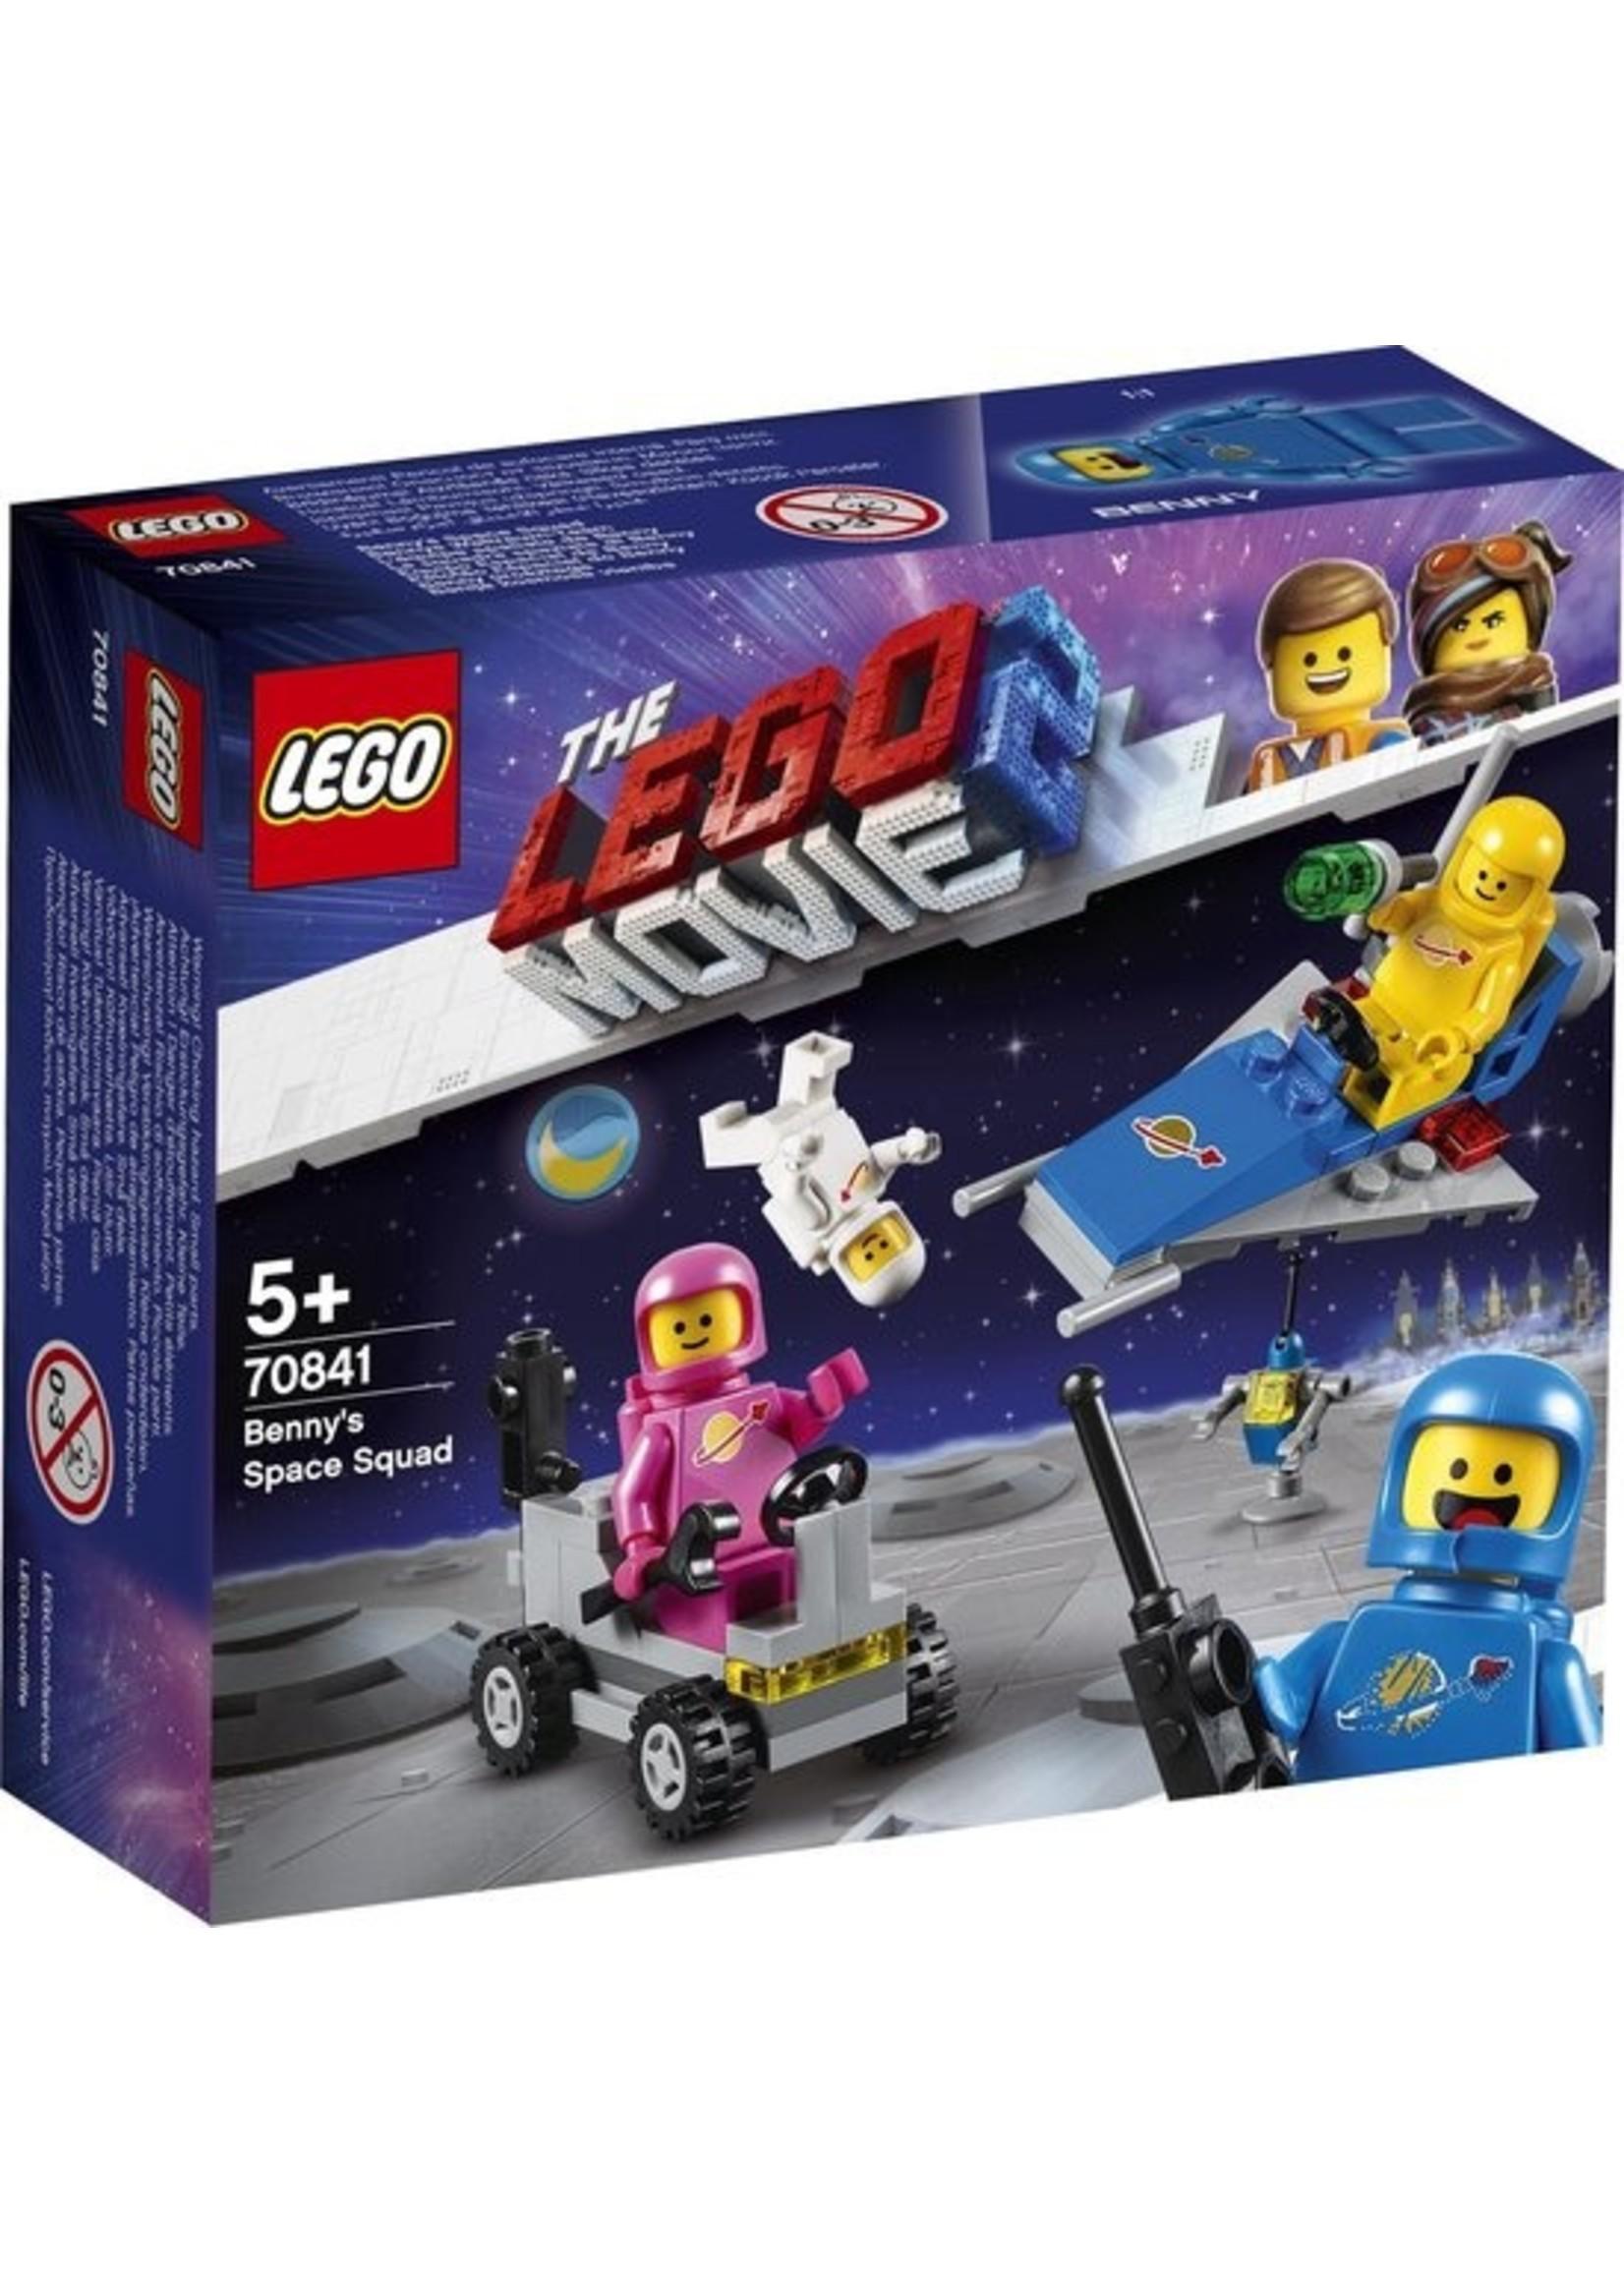 LEGO The Movie 2 Benny's Ruimteteam - 70841